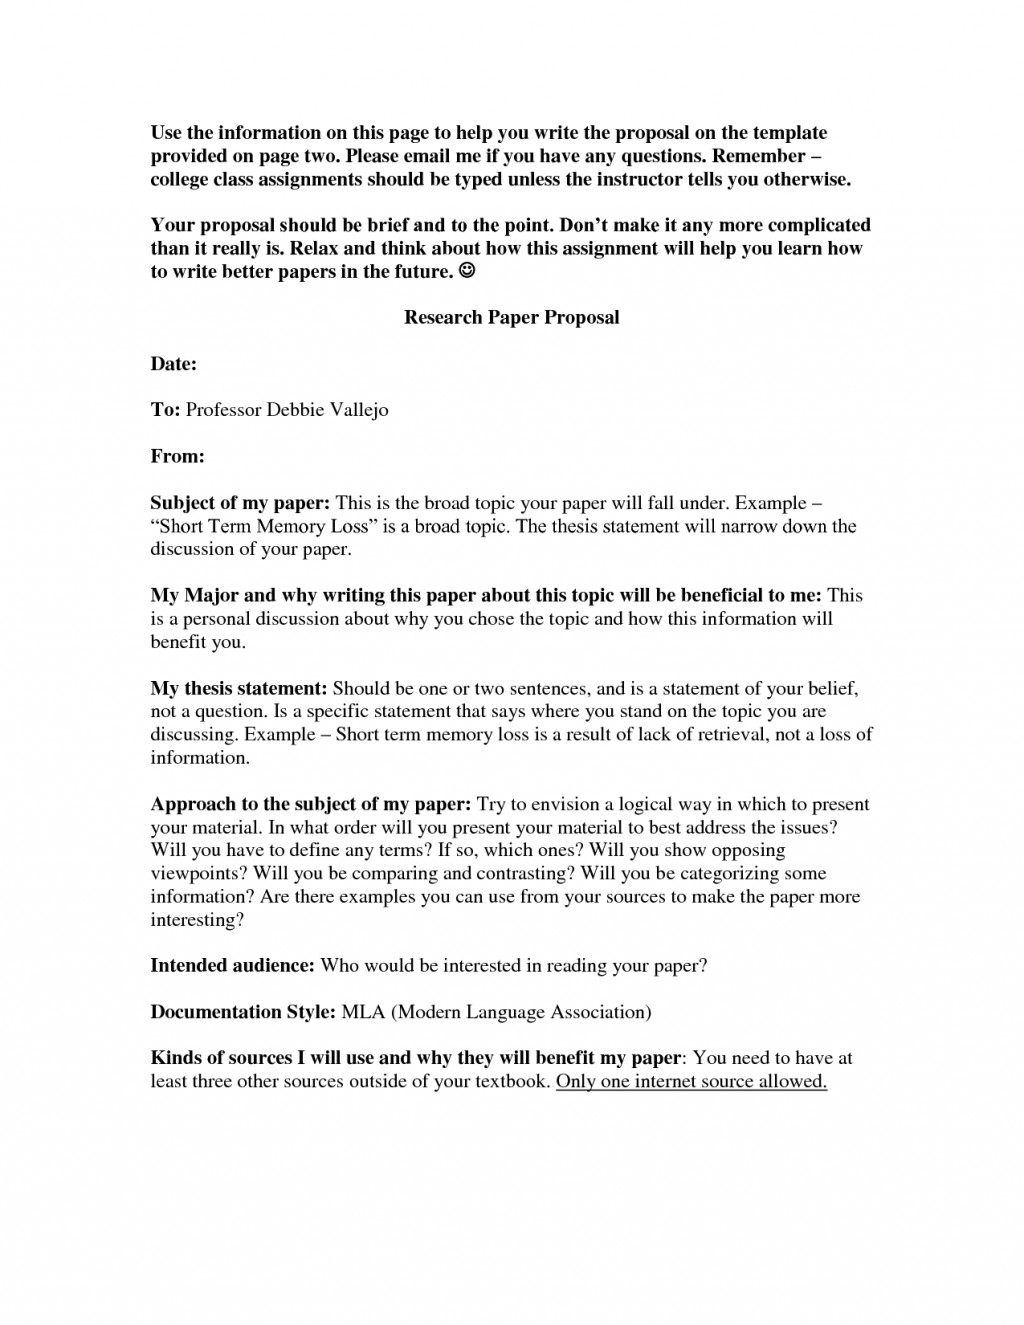 006 Essay Example Proposal Angel Beats 614610 Top Samples Mla Format Satirical Ideas Large